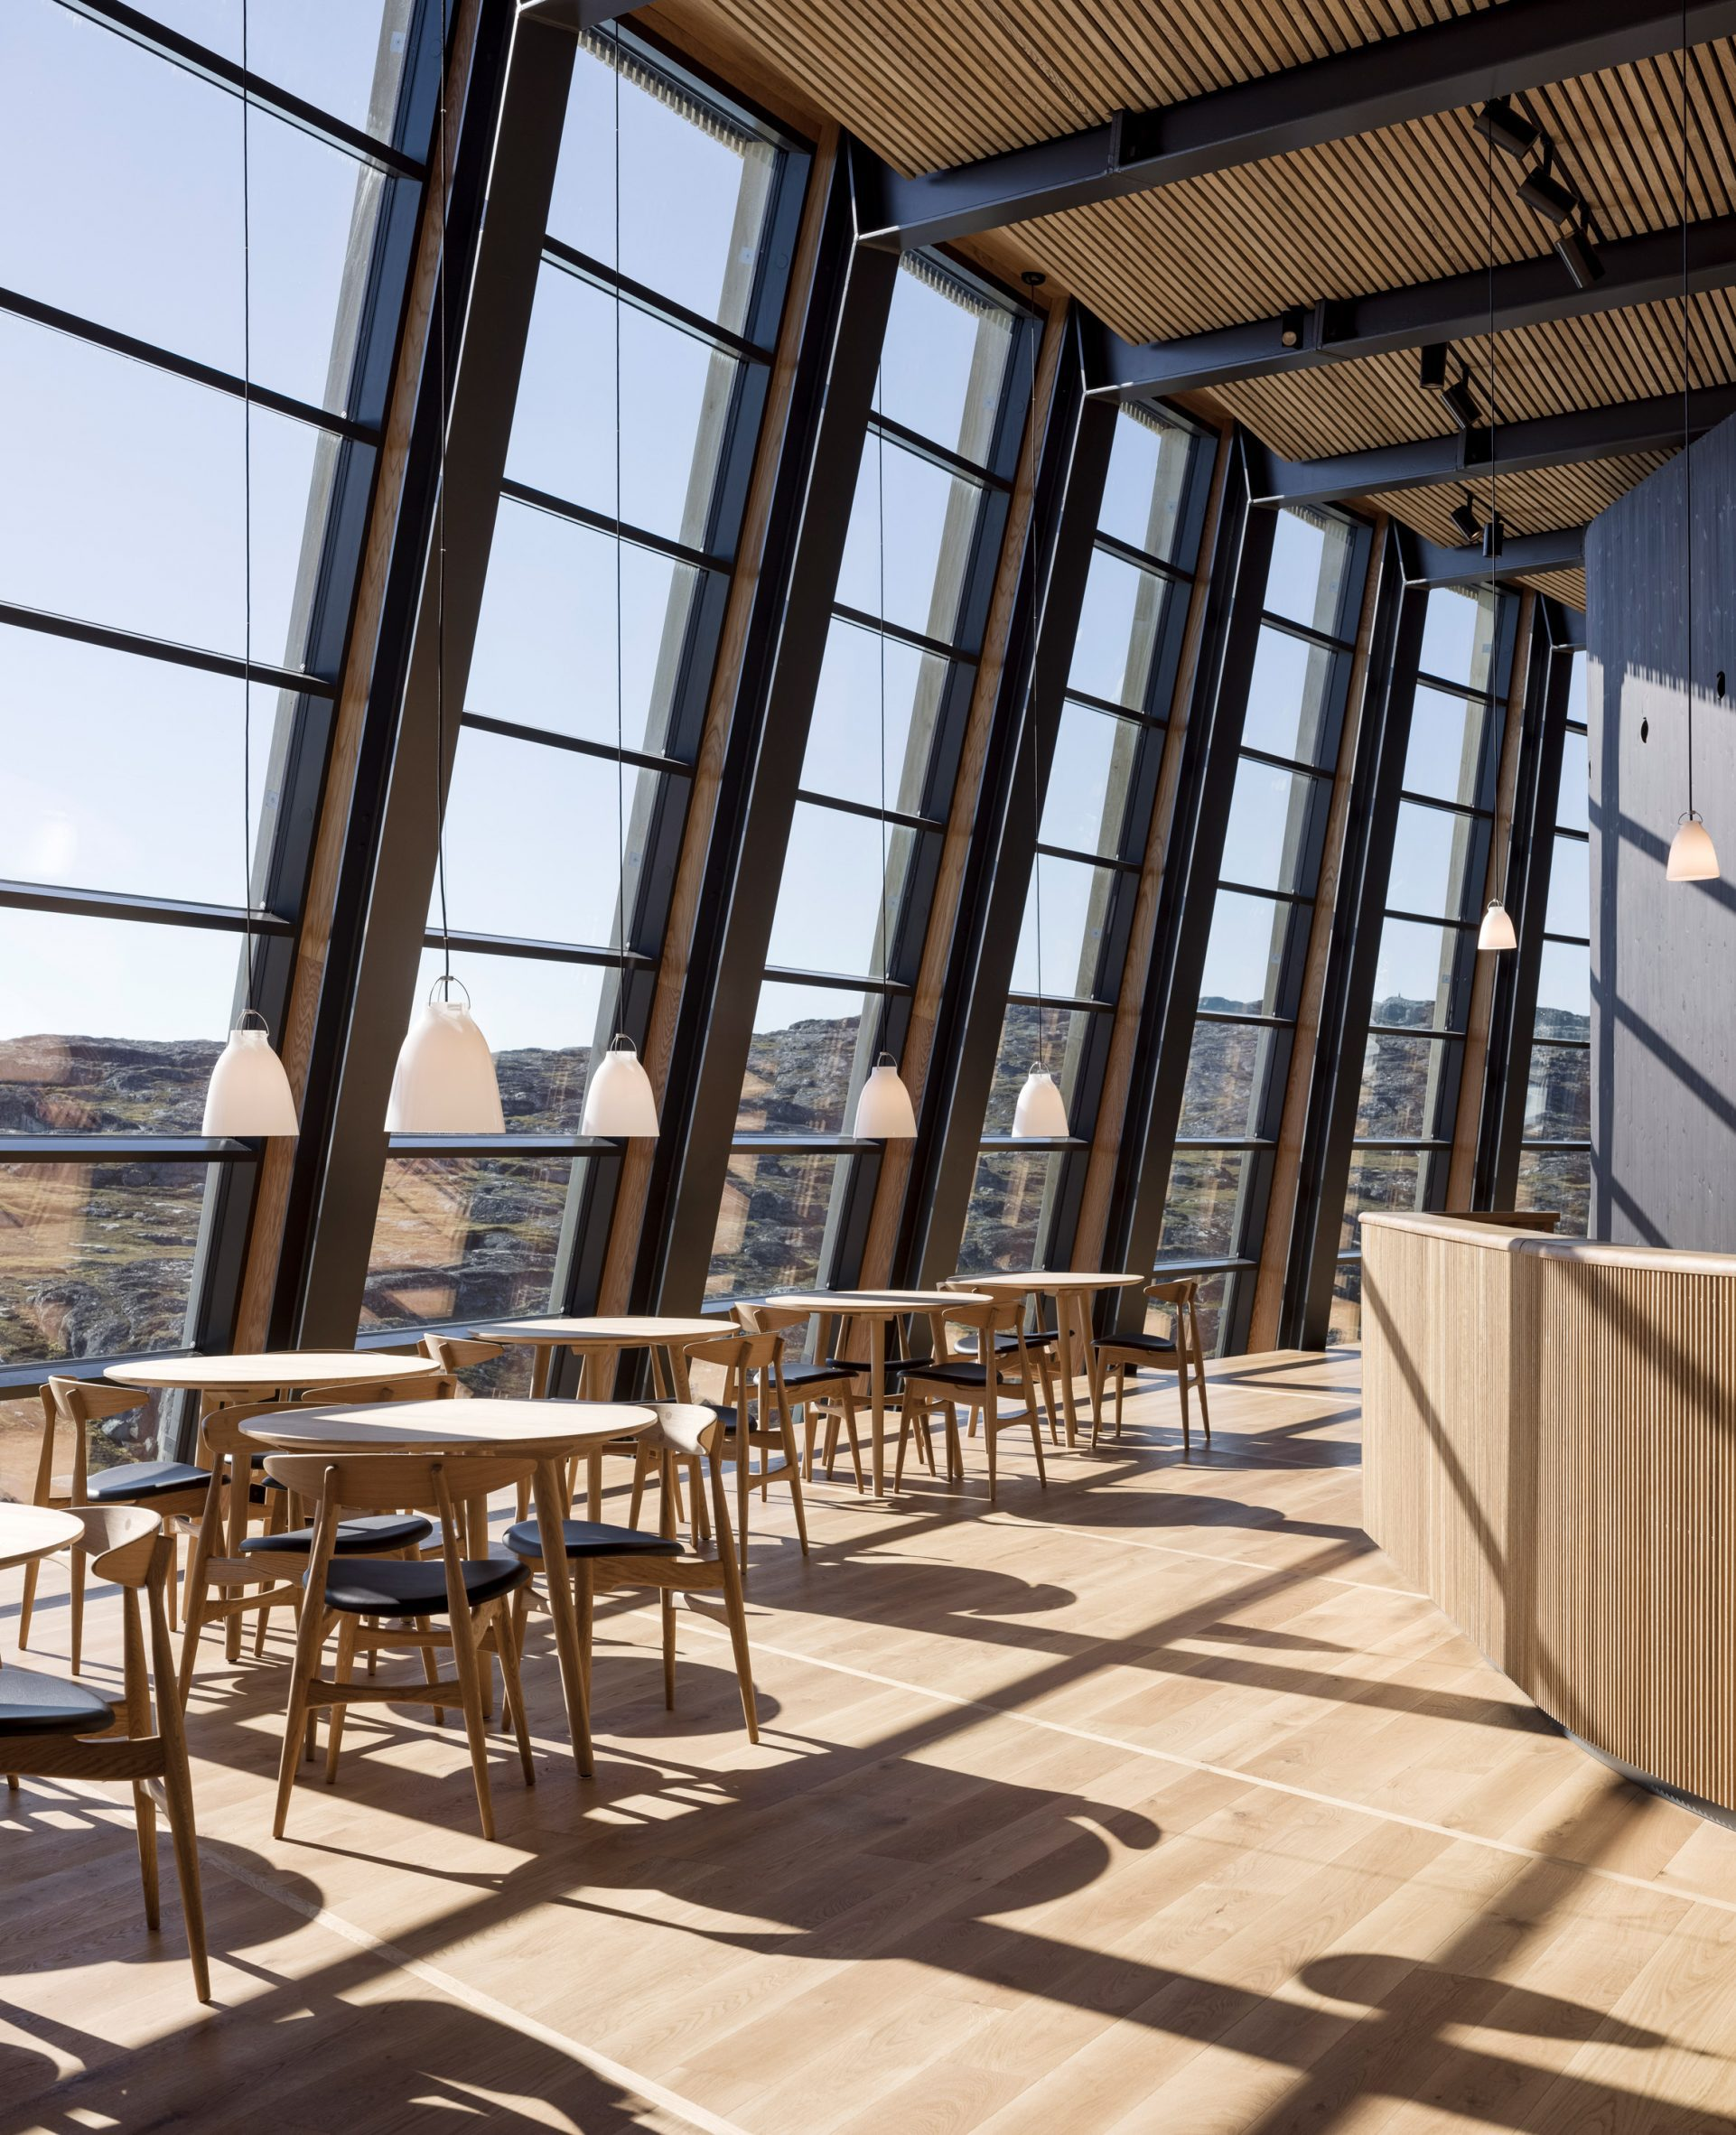 Cafe in Ilulissat Icefjord Centre by Dorte Mandrup Arkitekter